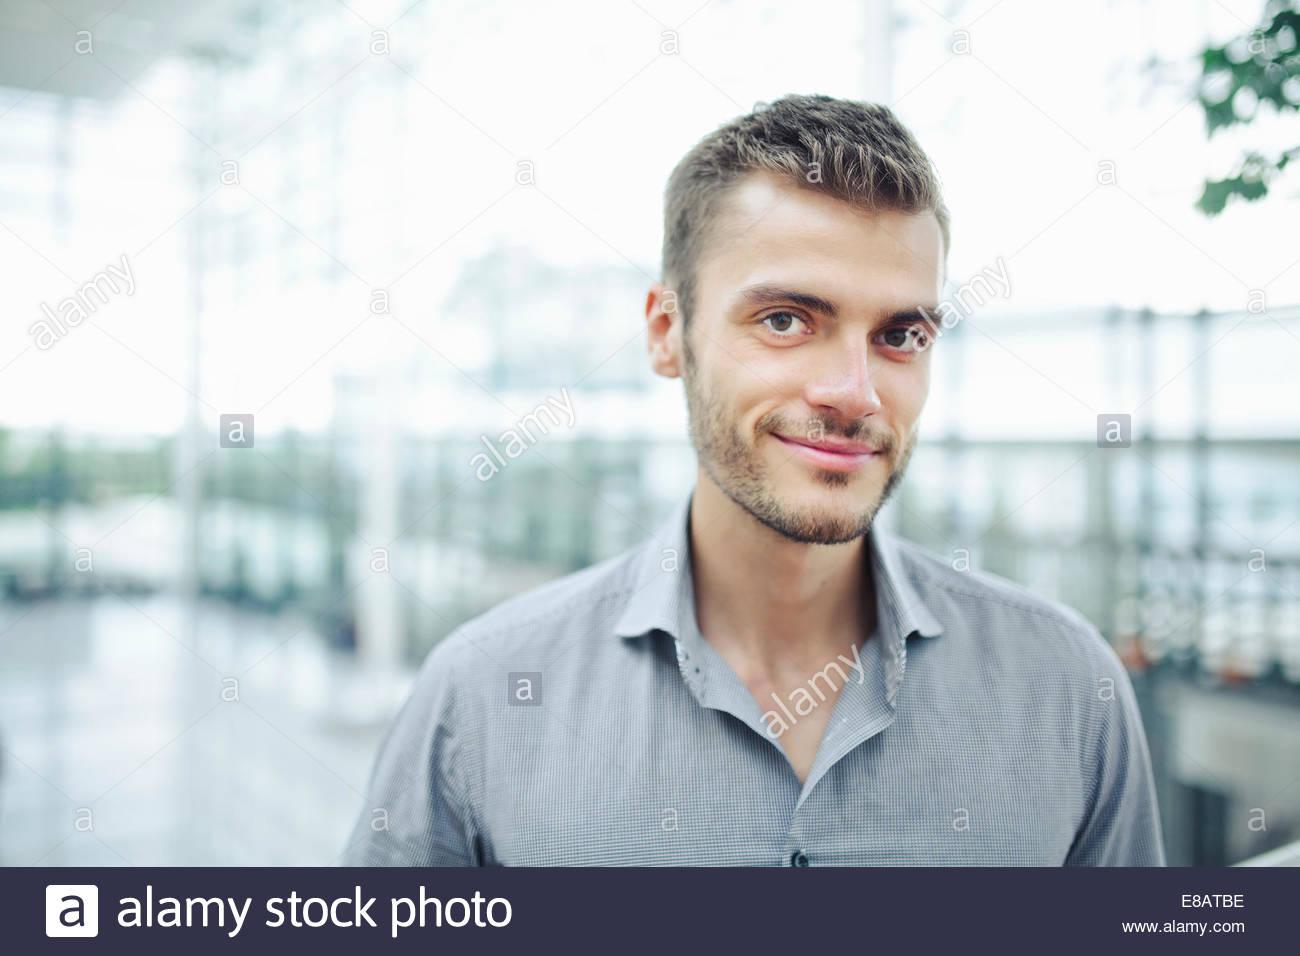 Young man wearing grey shirt, portrait - Stock Image